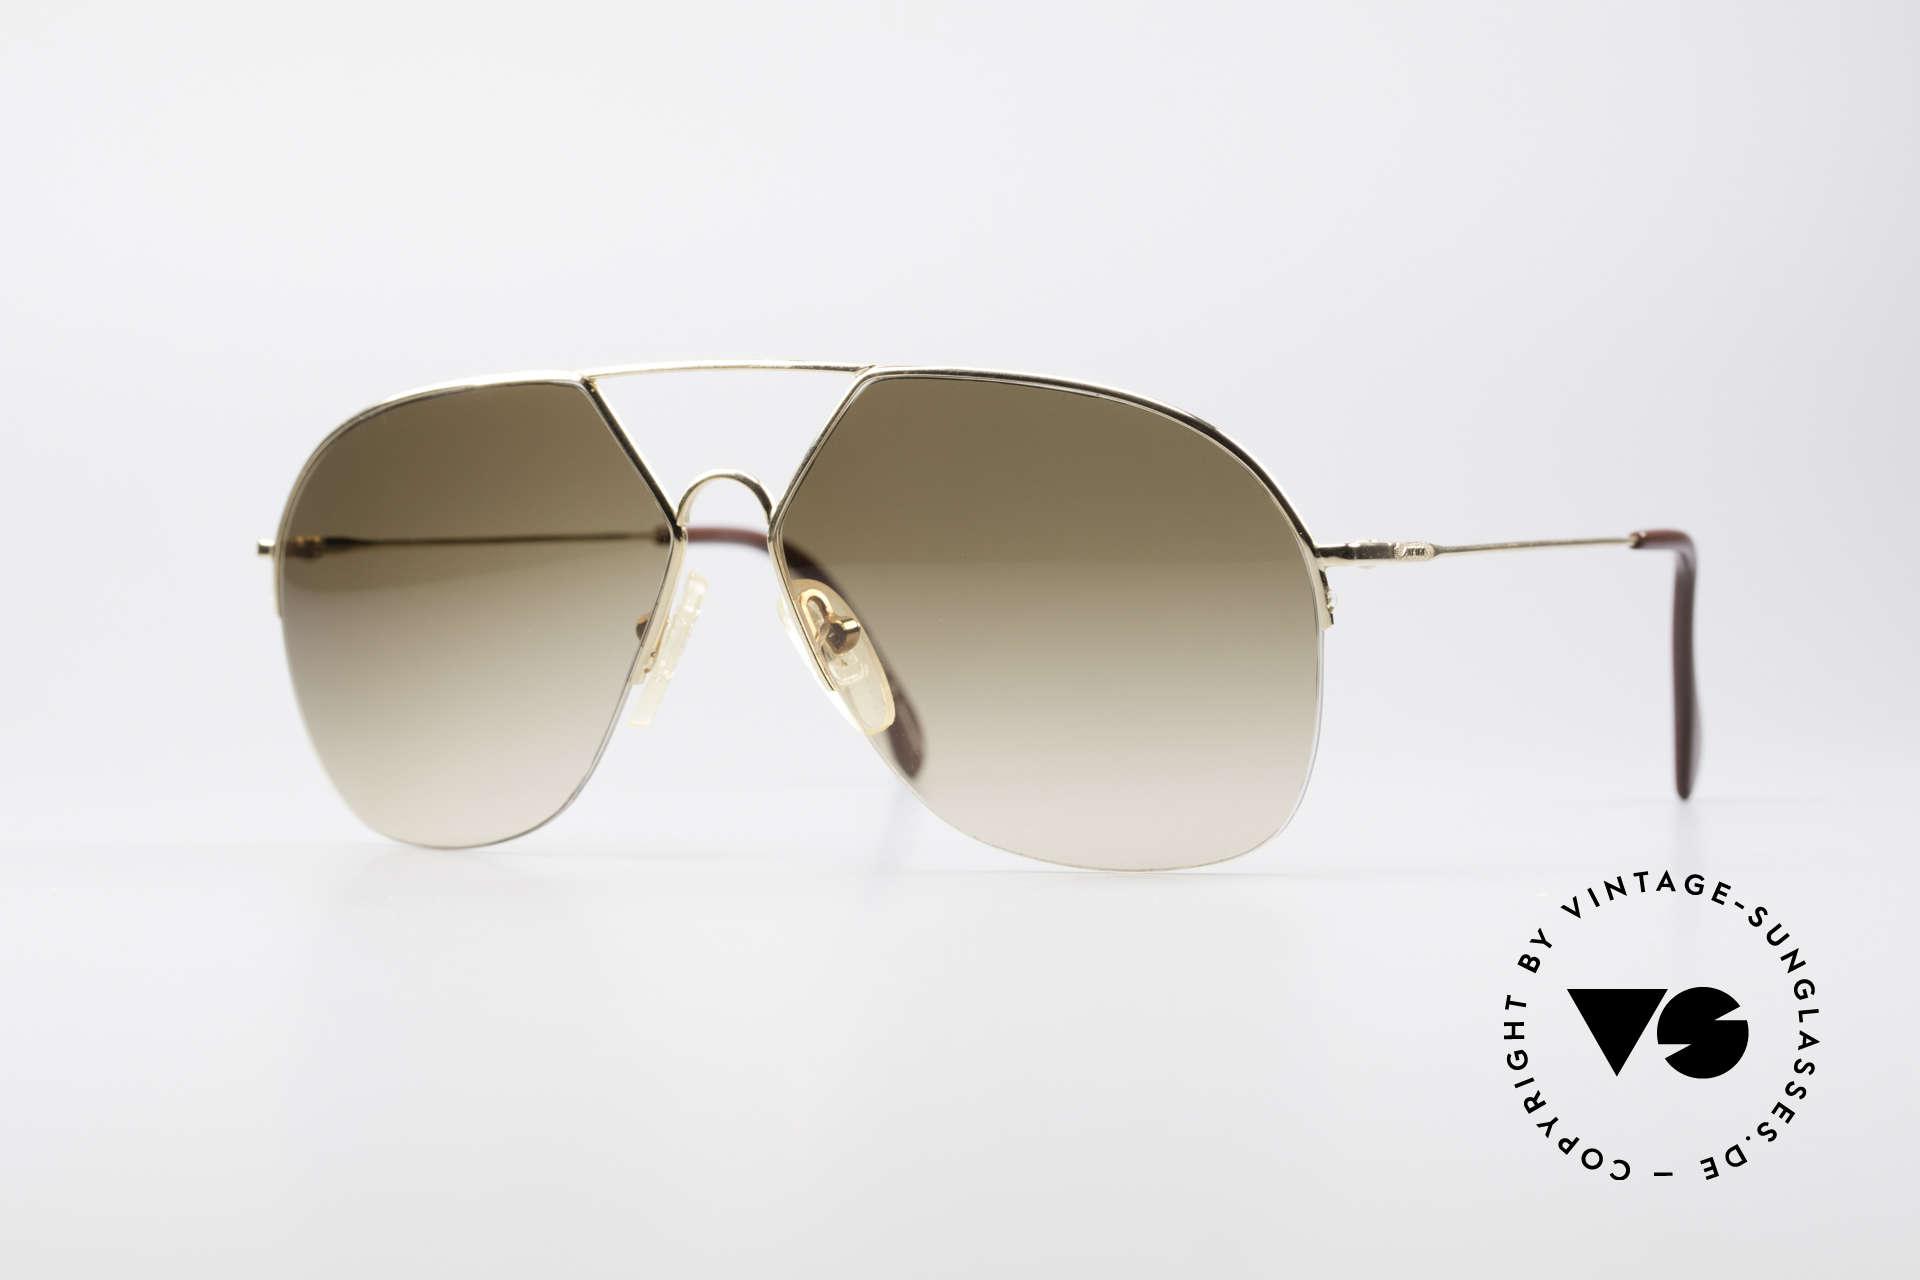 Alpina TR7 Rimless 80's Aviator Frame, rare Alpina 80's sunglasses (made in W.Germany), Made for Men